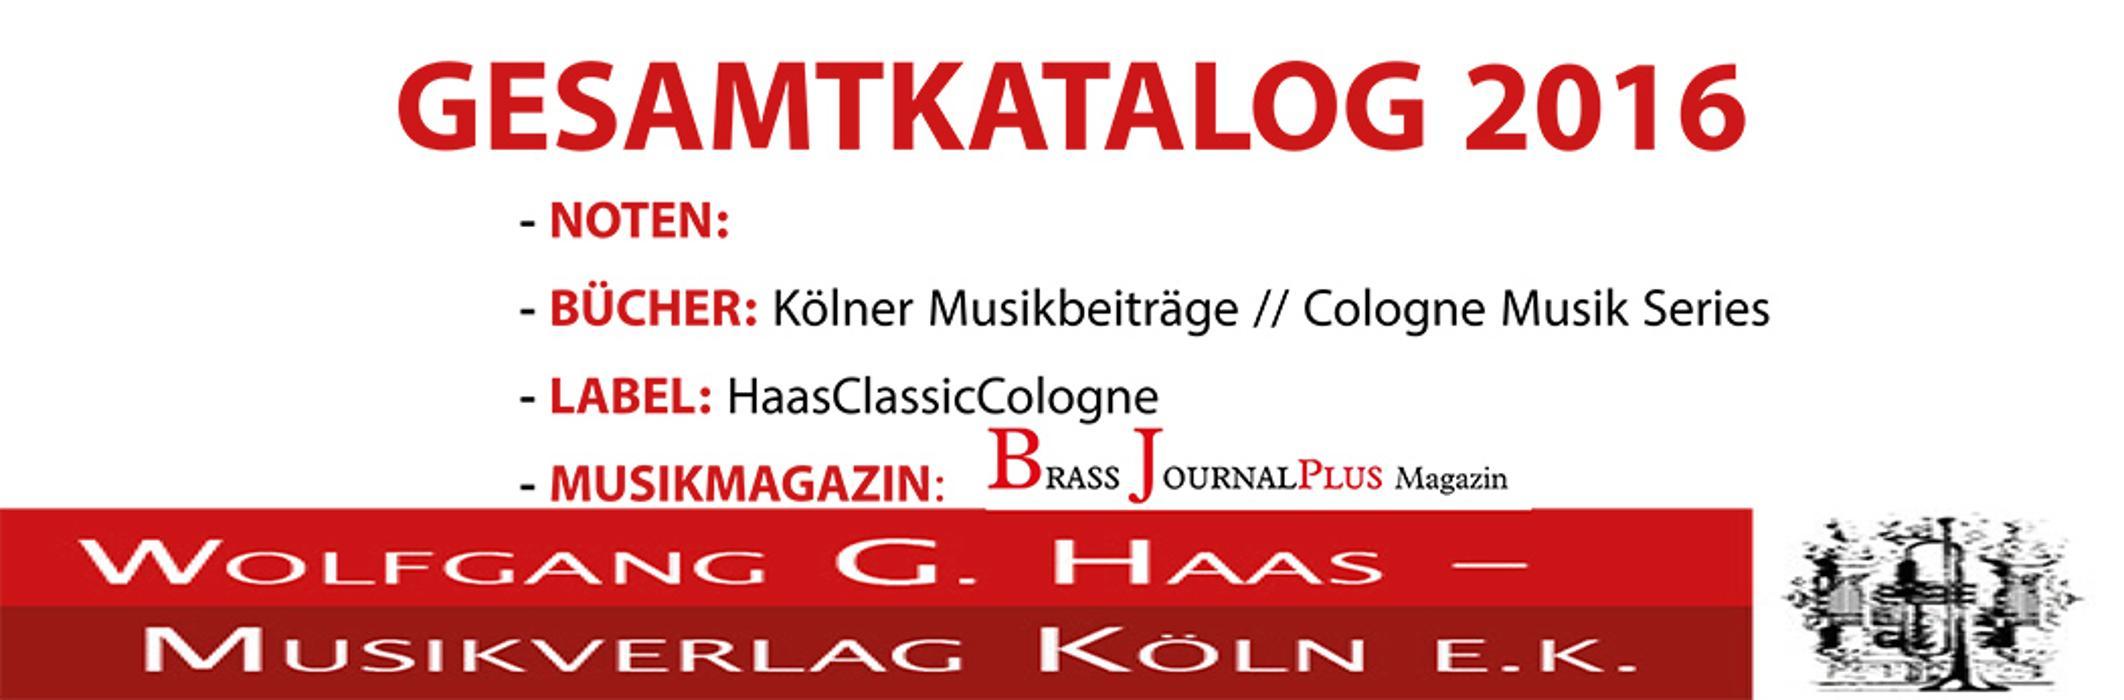 Bild zu Wolfgang G. Haas-Musikverlag Köln e. K. in Köln